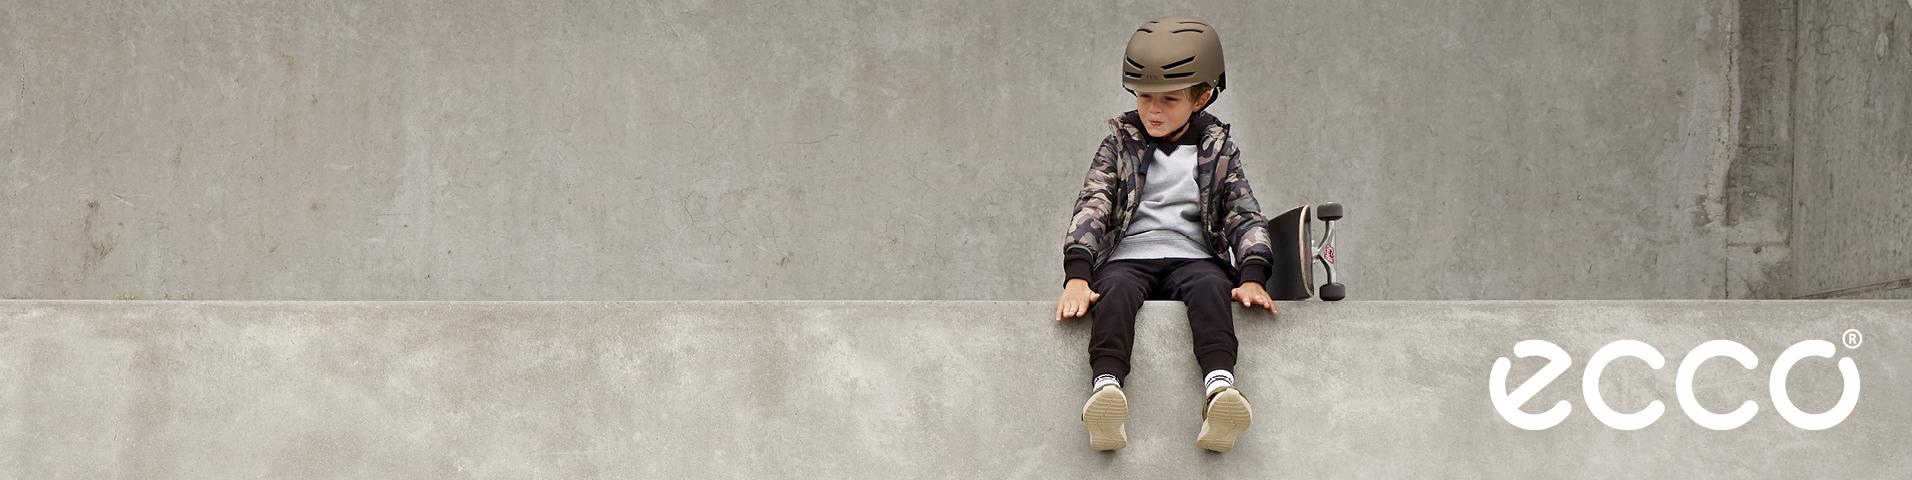 aebdd83e5a9 Ecco Kids' Shoes | Girls, Boys & Baby Shoes | ZALANDO